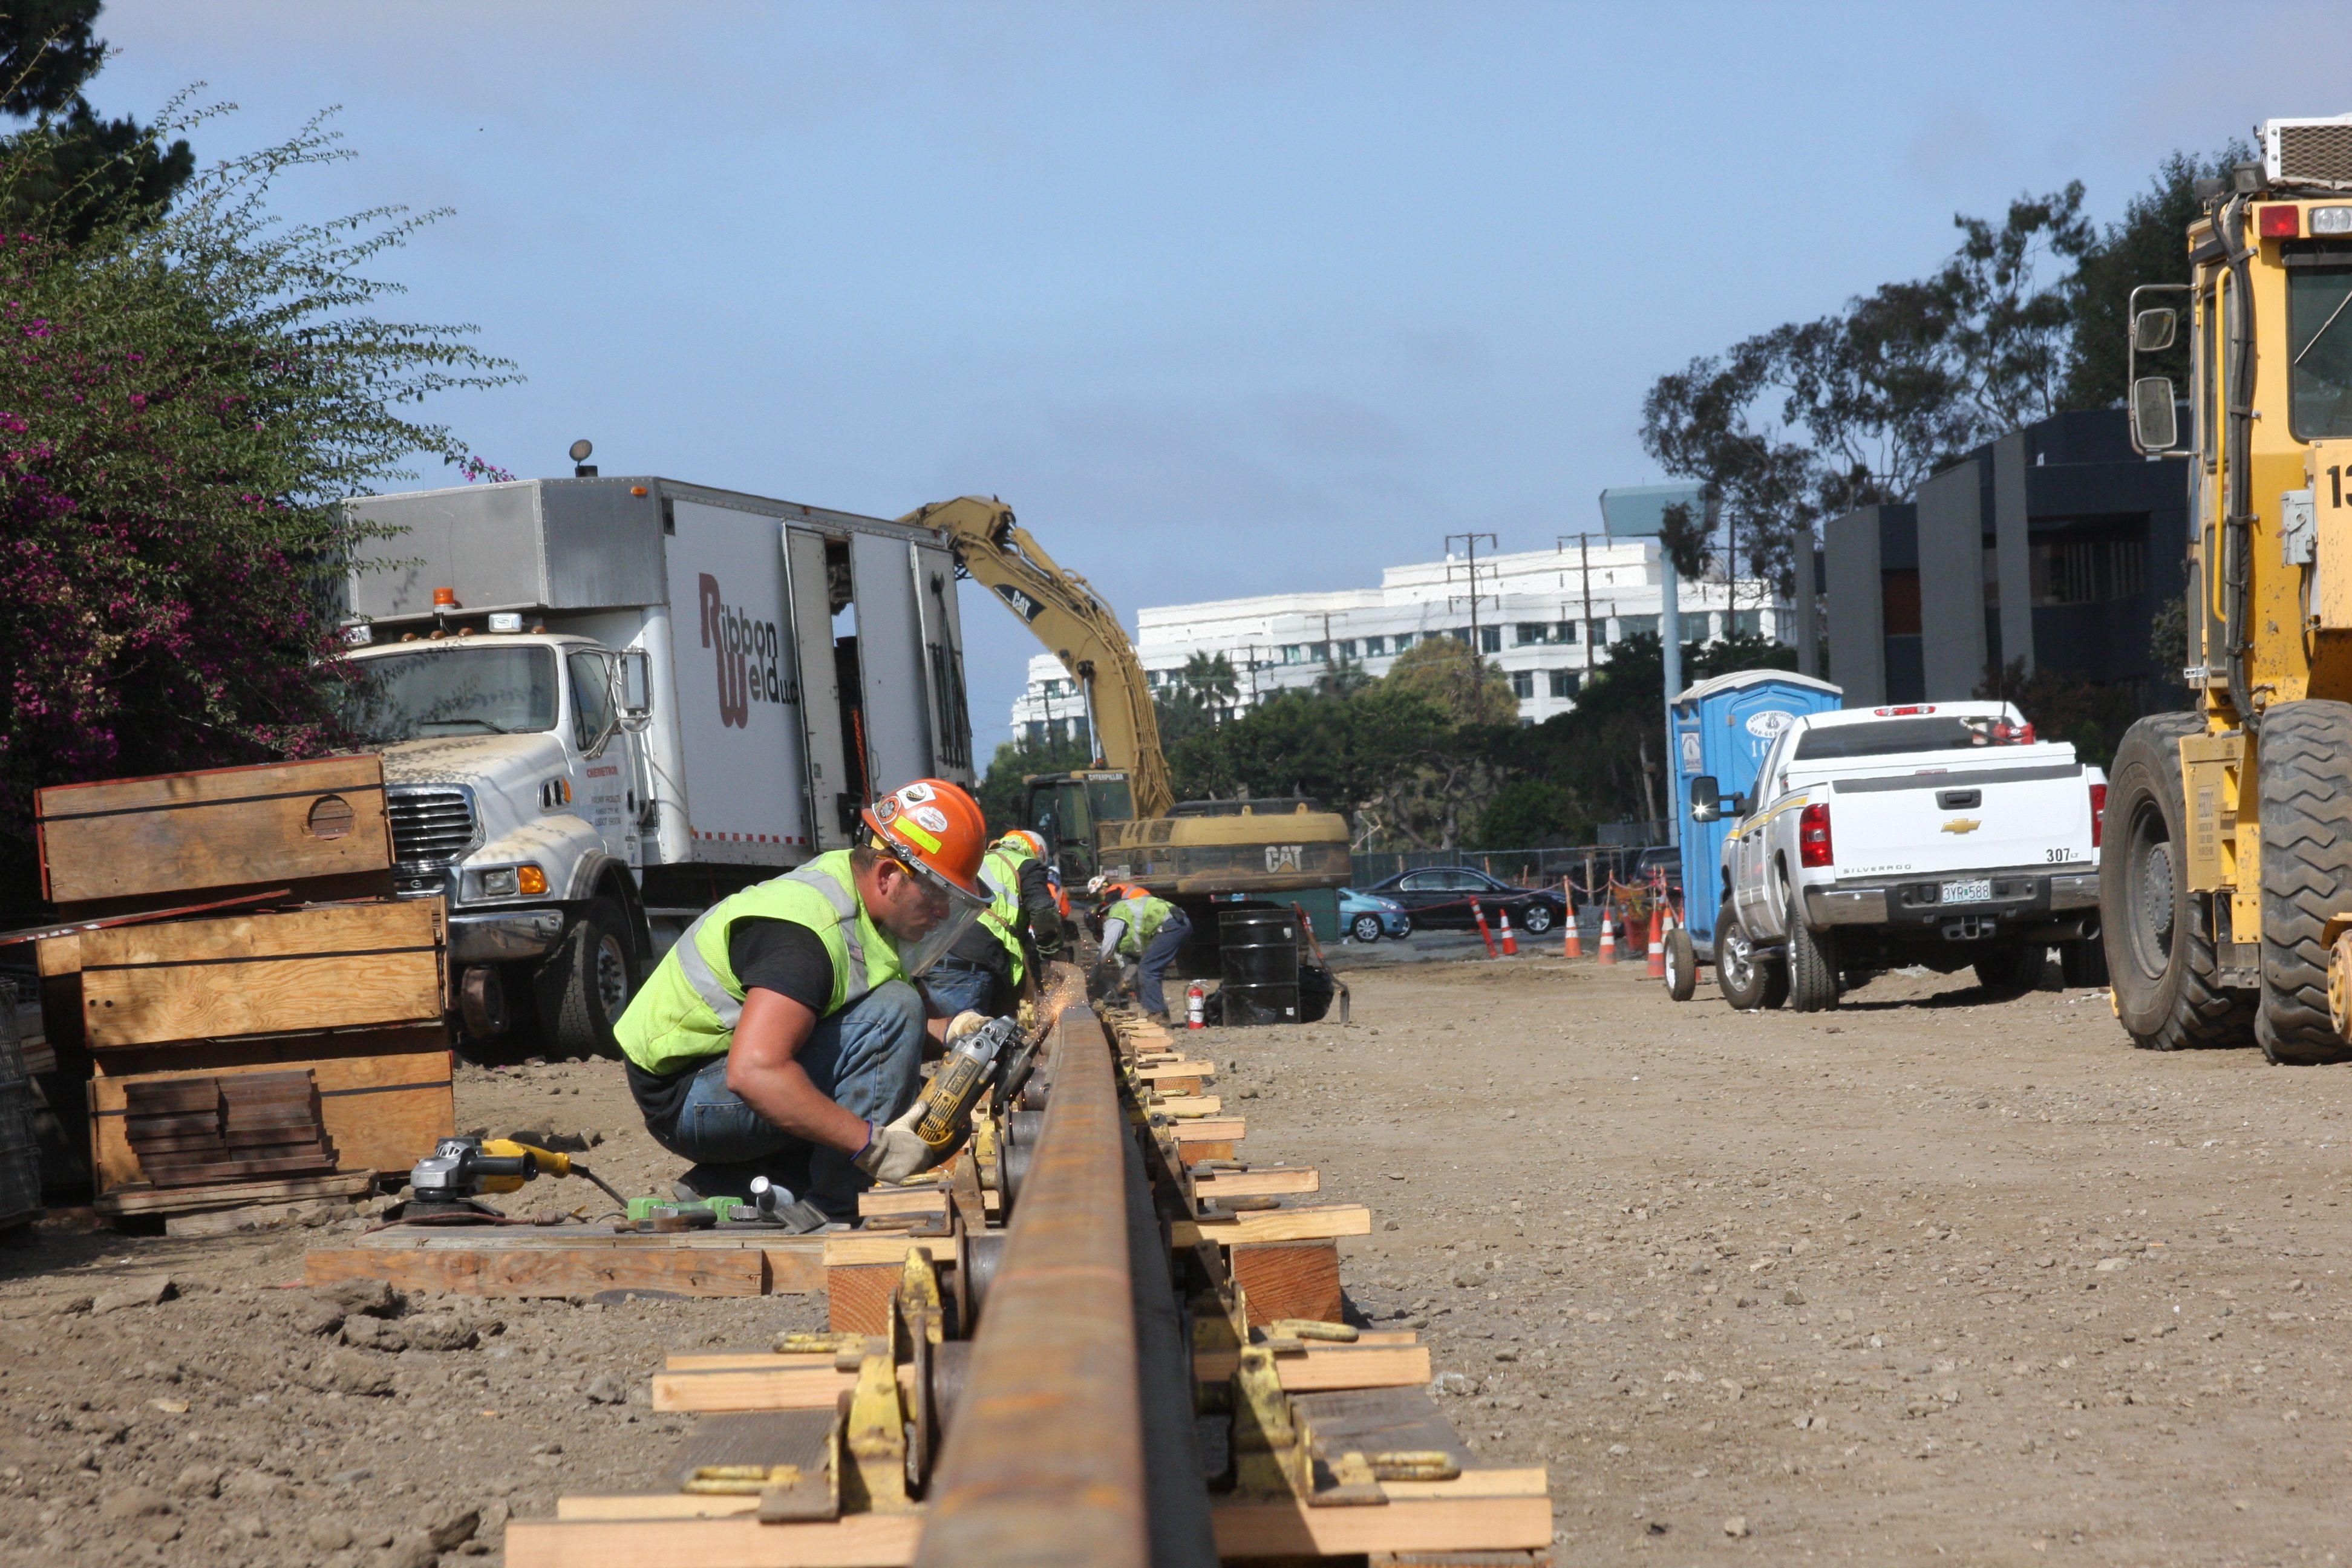 Rail welding for the Expo Line near Stewart Street in Santa Monica.